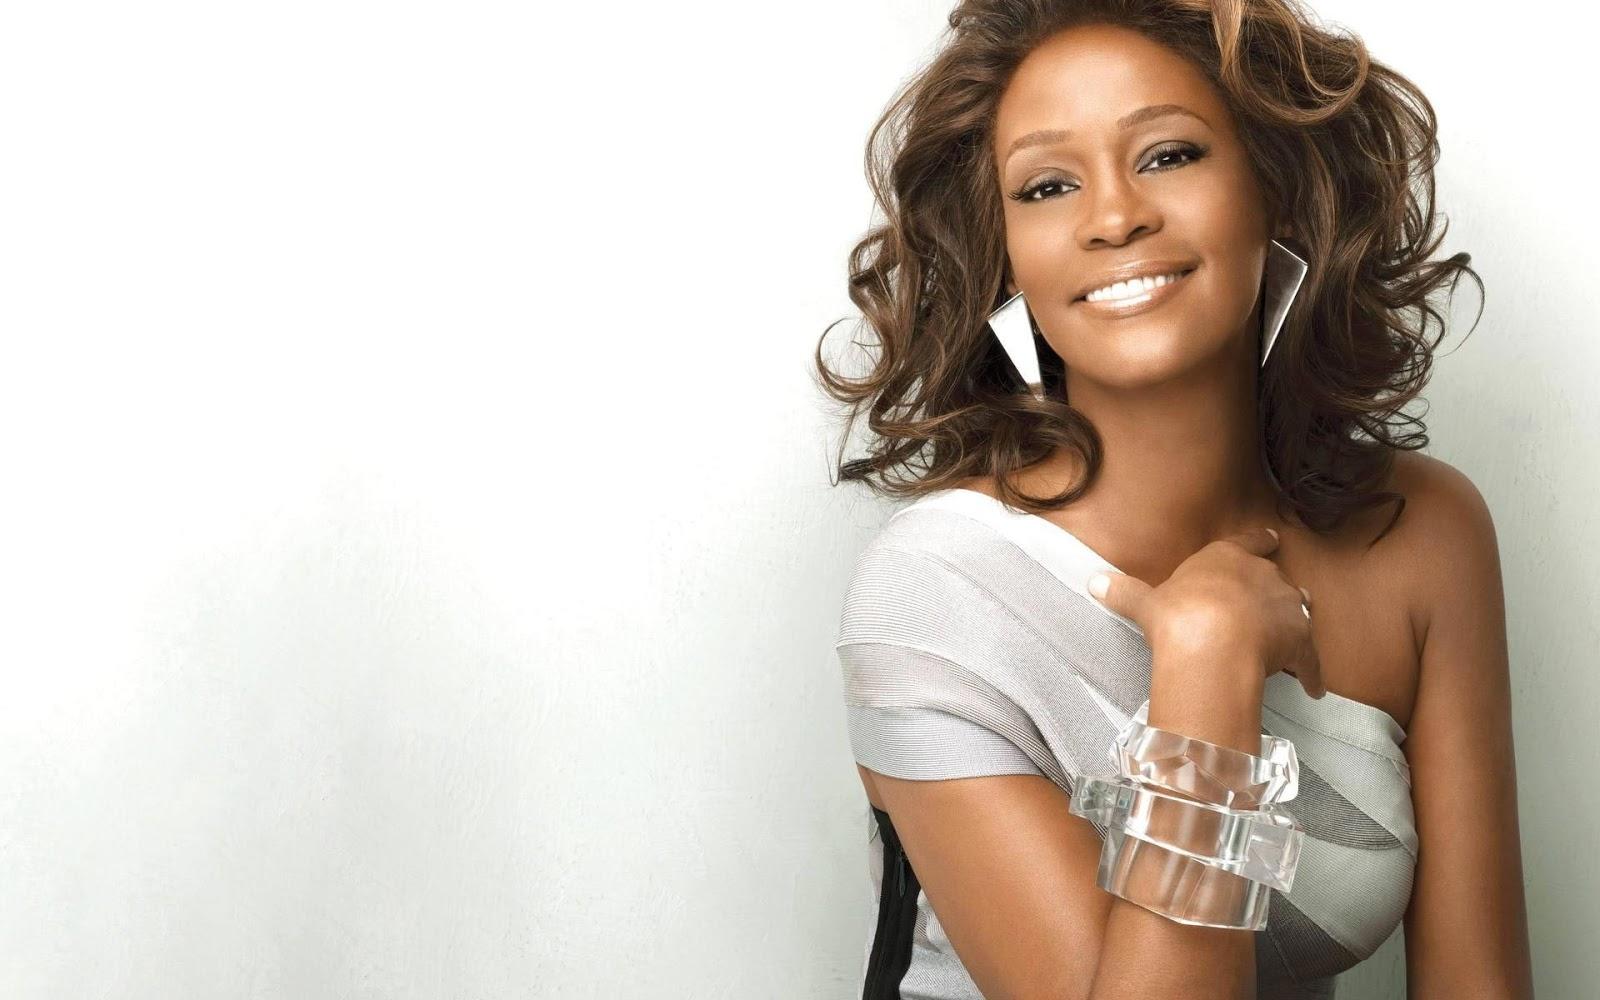 List Of Female Singers Here Is The Top 10 List Of Female Singers Smileandhra